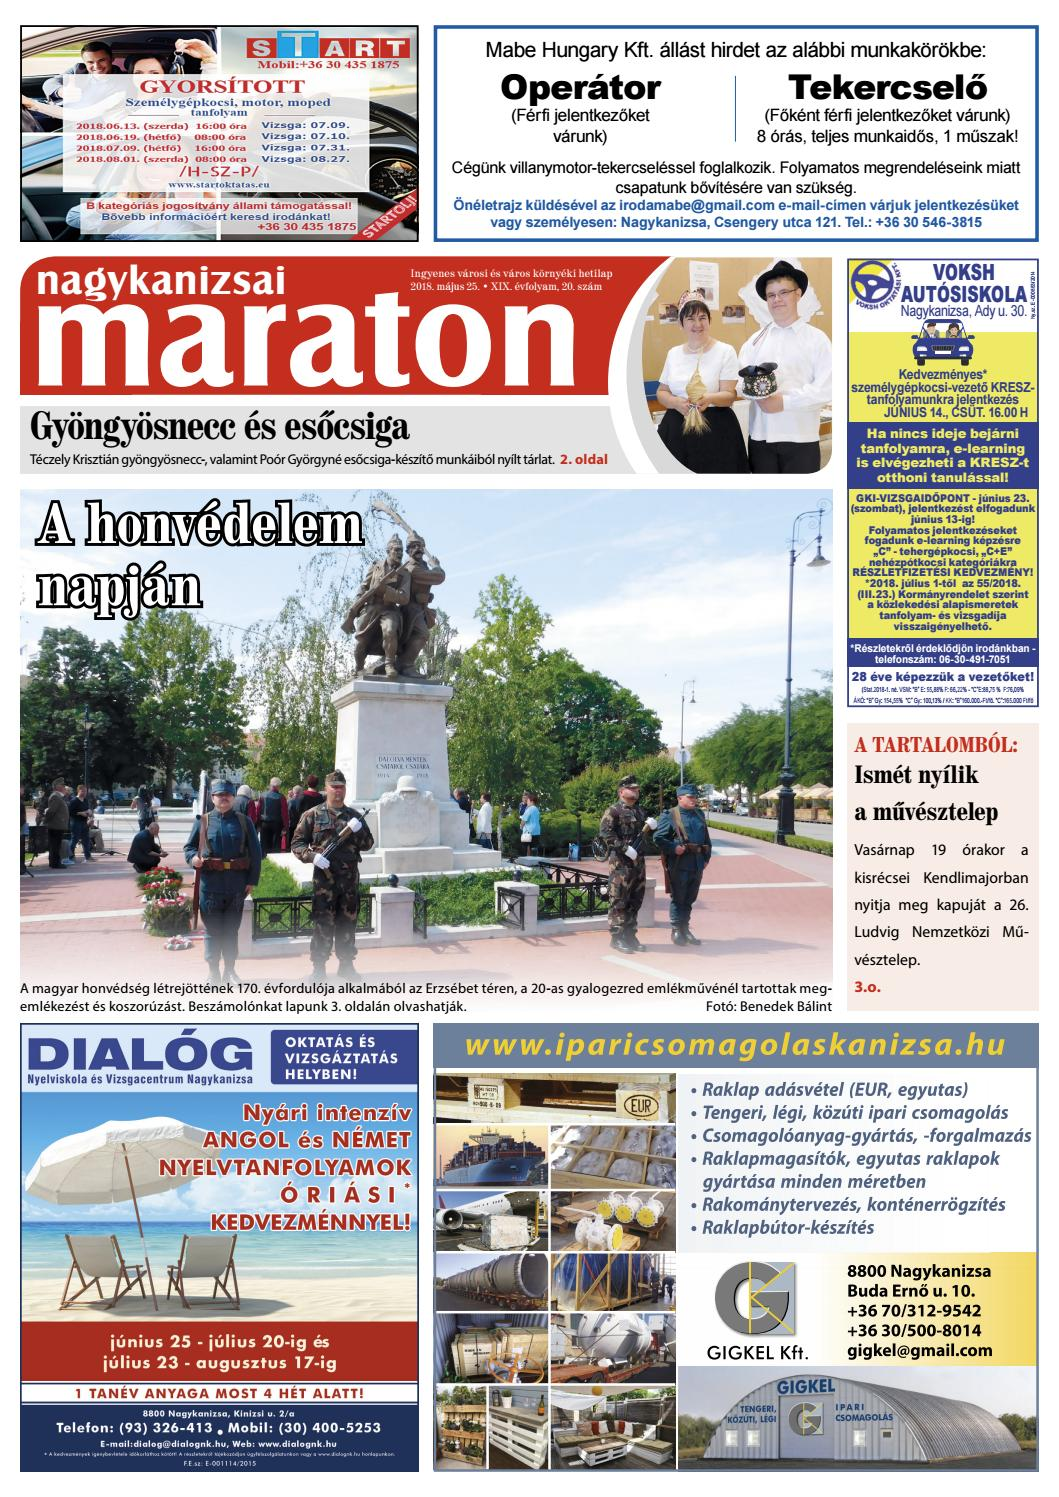 a9b5064838f Nagykanizsai Maraton - 2018. 05. 25. by Maraton Lapcsoport Kft. - issuu